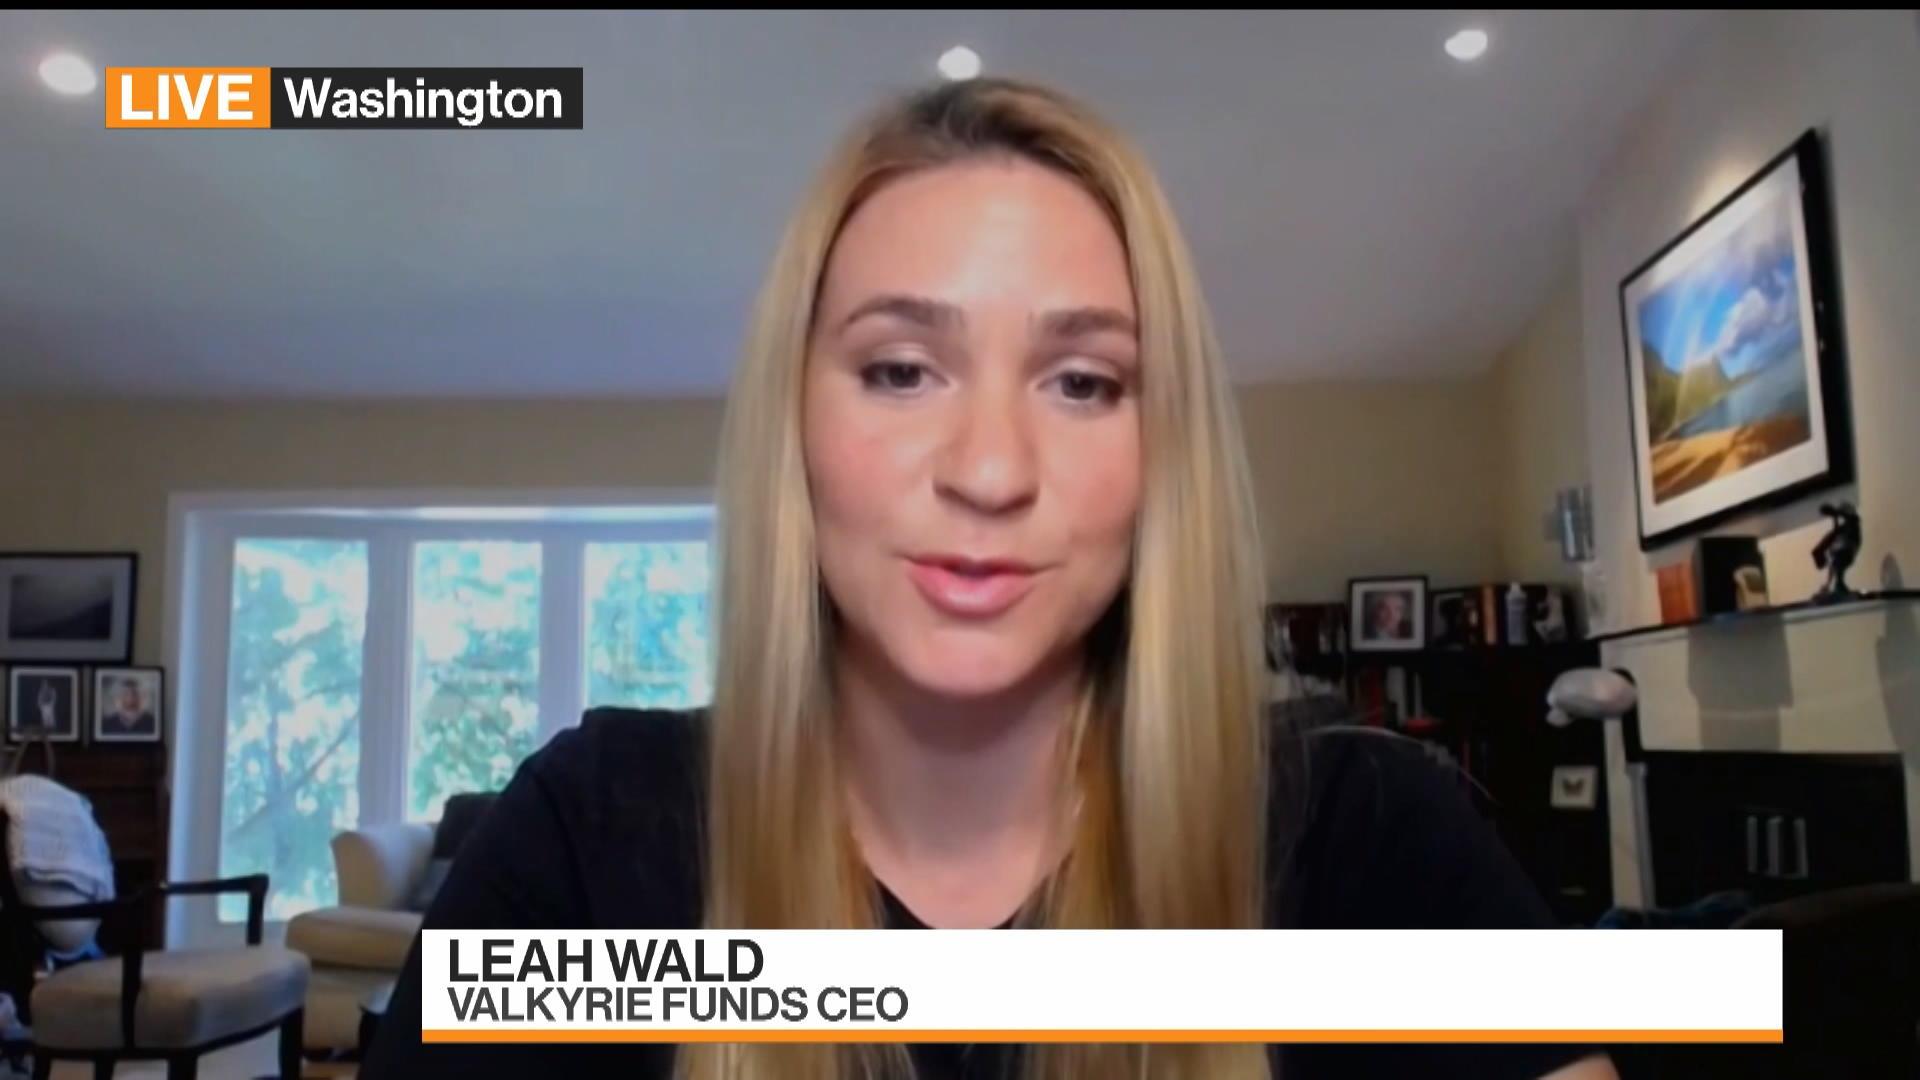 Valkyrie Funds CEO Leah Wald on choosing Nasdaq exchange - مدیر عامل شرکت سرمایه گذاری والکری: بورس نزدک، تنها انتخاب بدیهی ما برای نخستین ETF شرکت بود